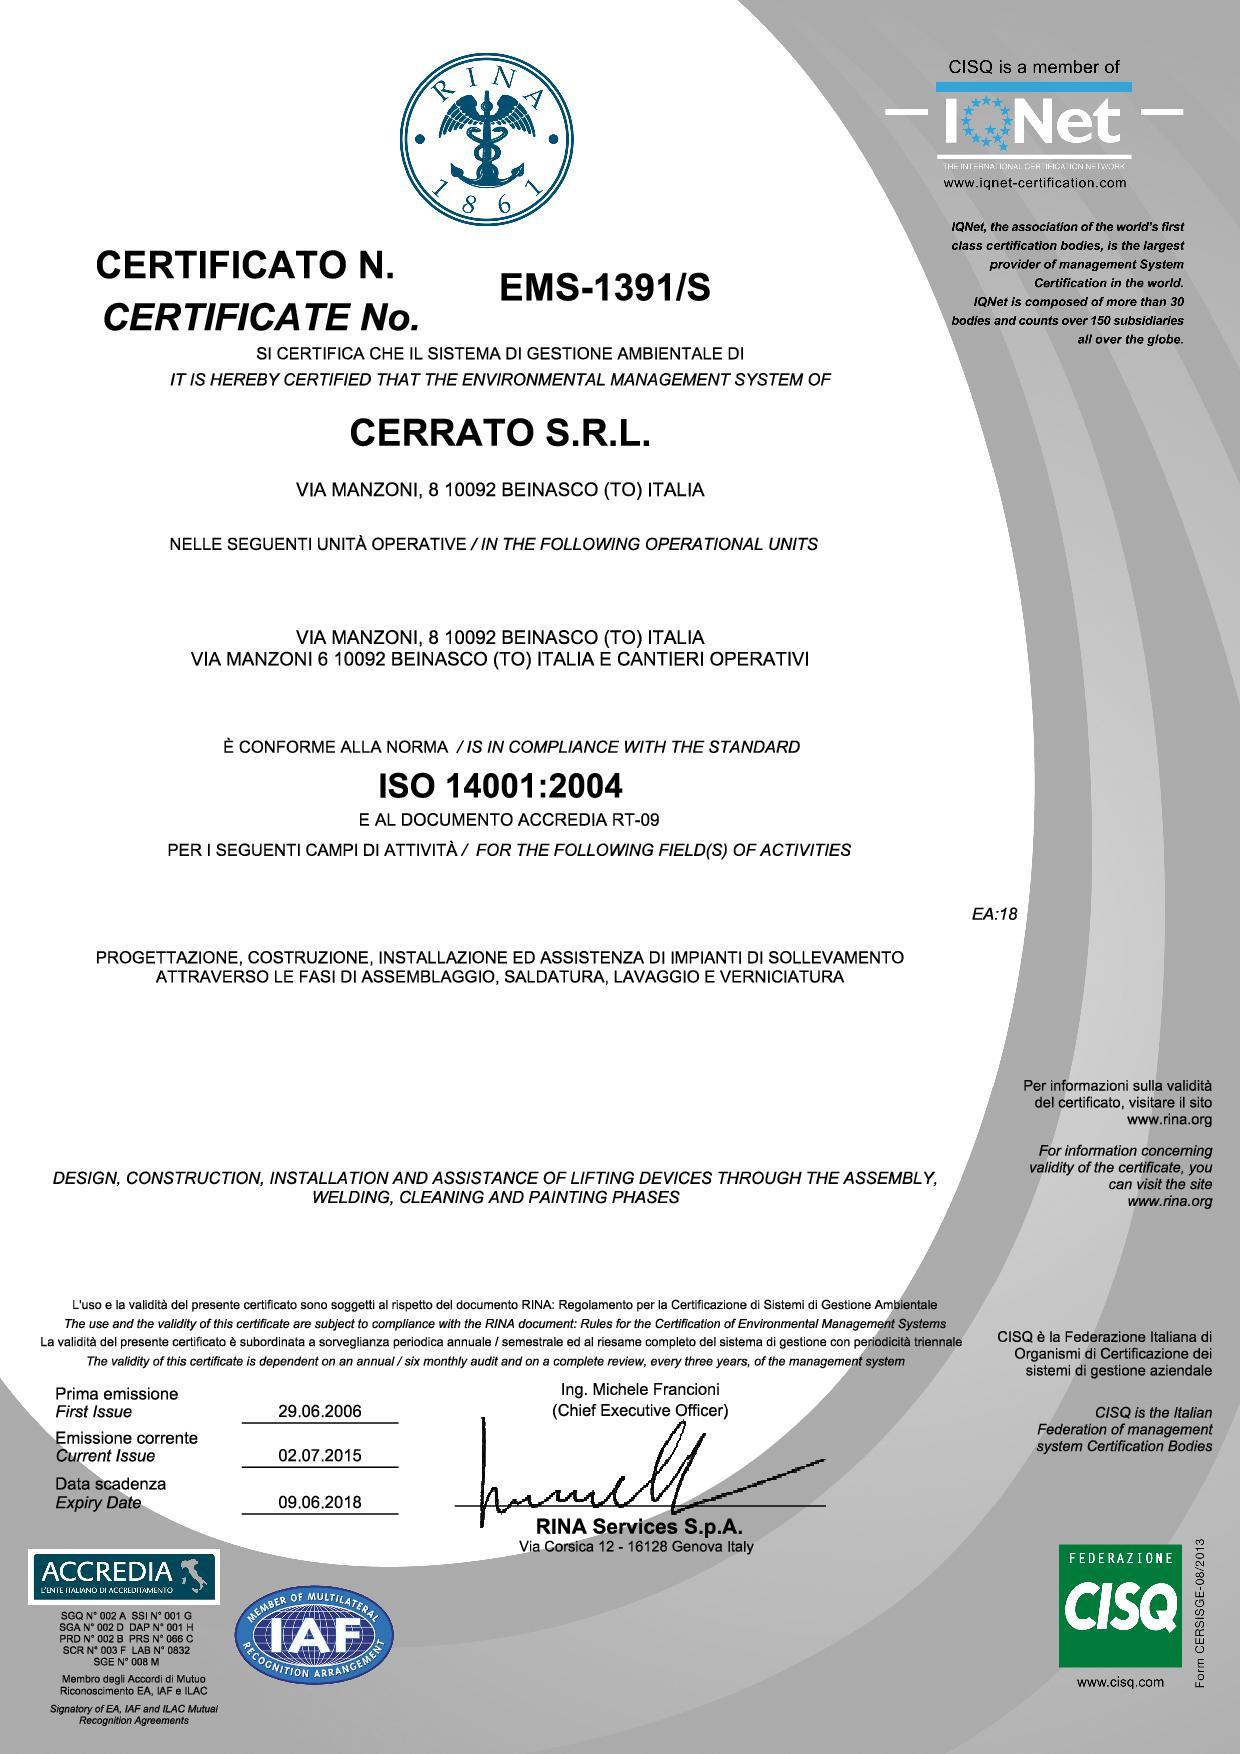 Certifications for Cerrato srl in Beinasco